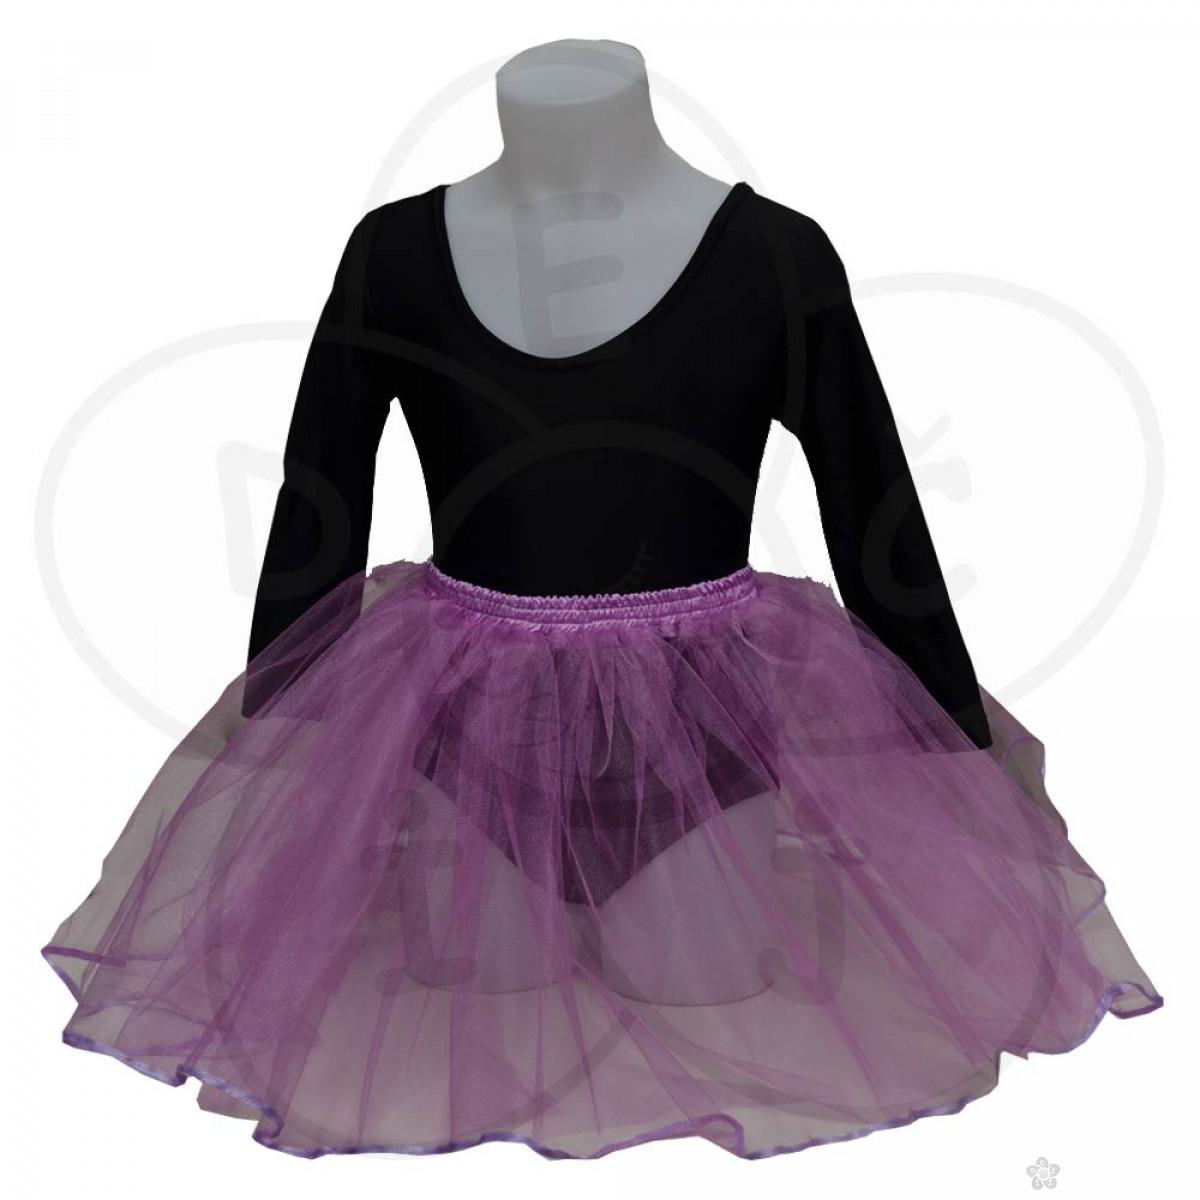 Baletska suknjica, lila